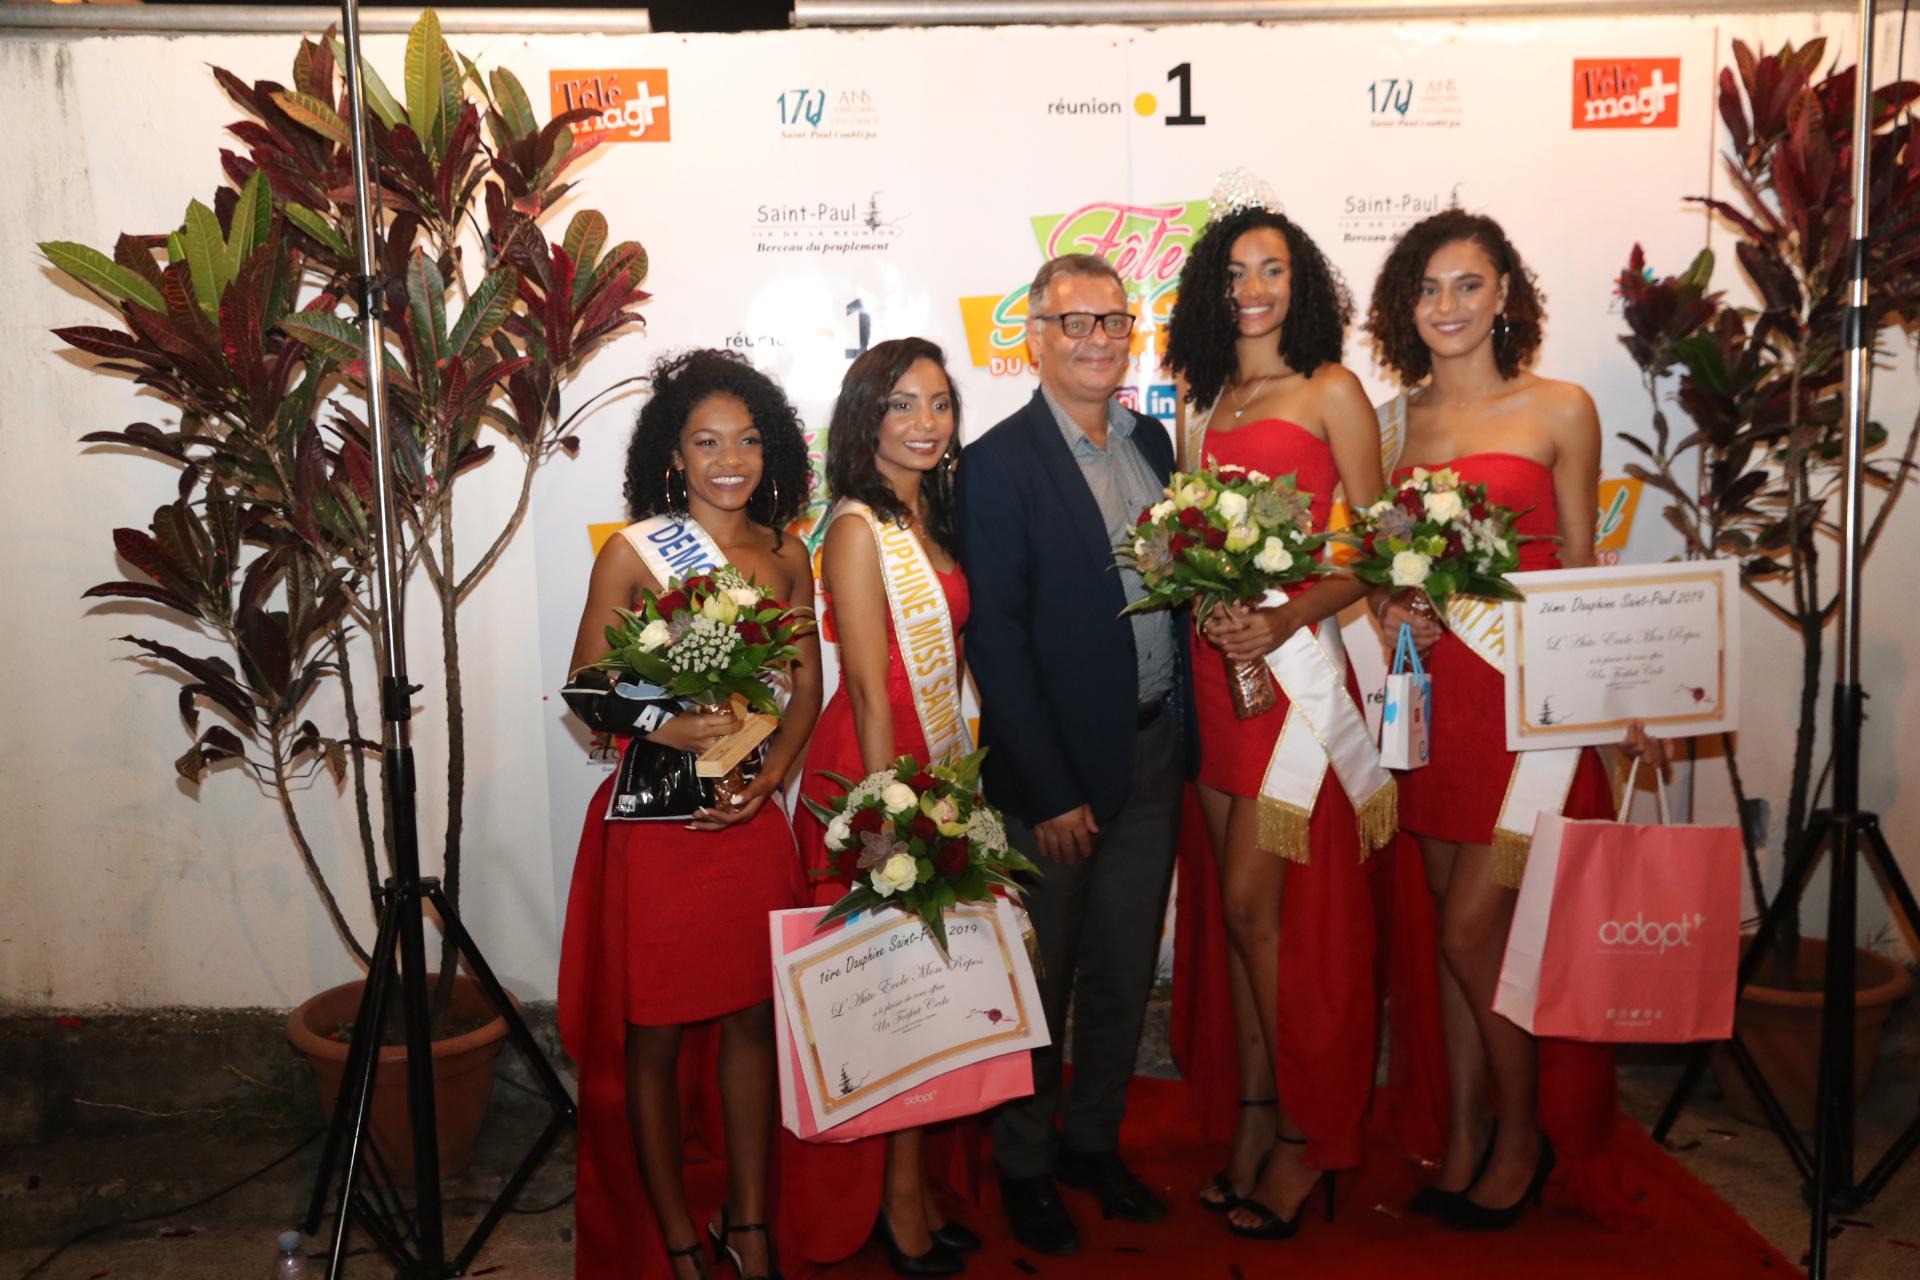 Miss Saint-Paul 2019: Mélanie Odules élue